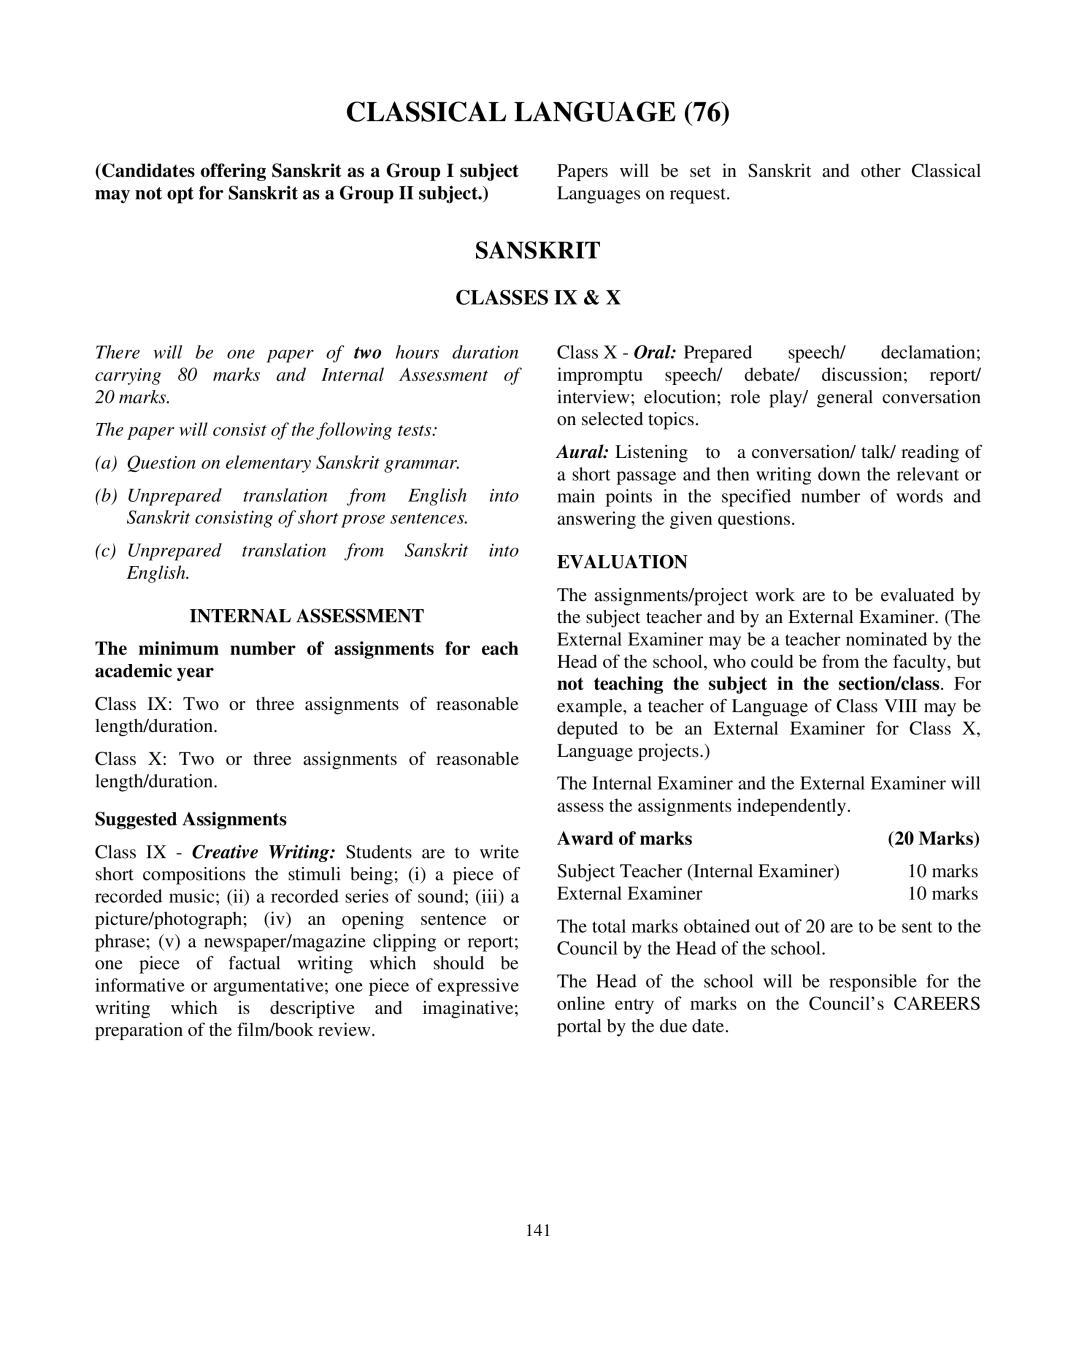 ICSE Class 10 Classical Language Syllabus 2021 - Page 1